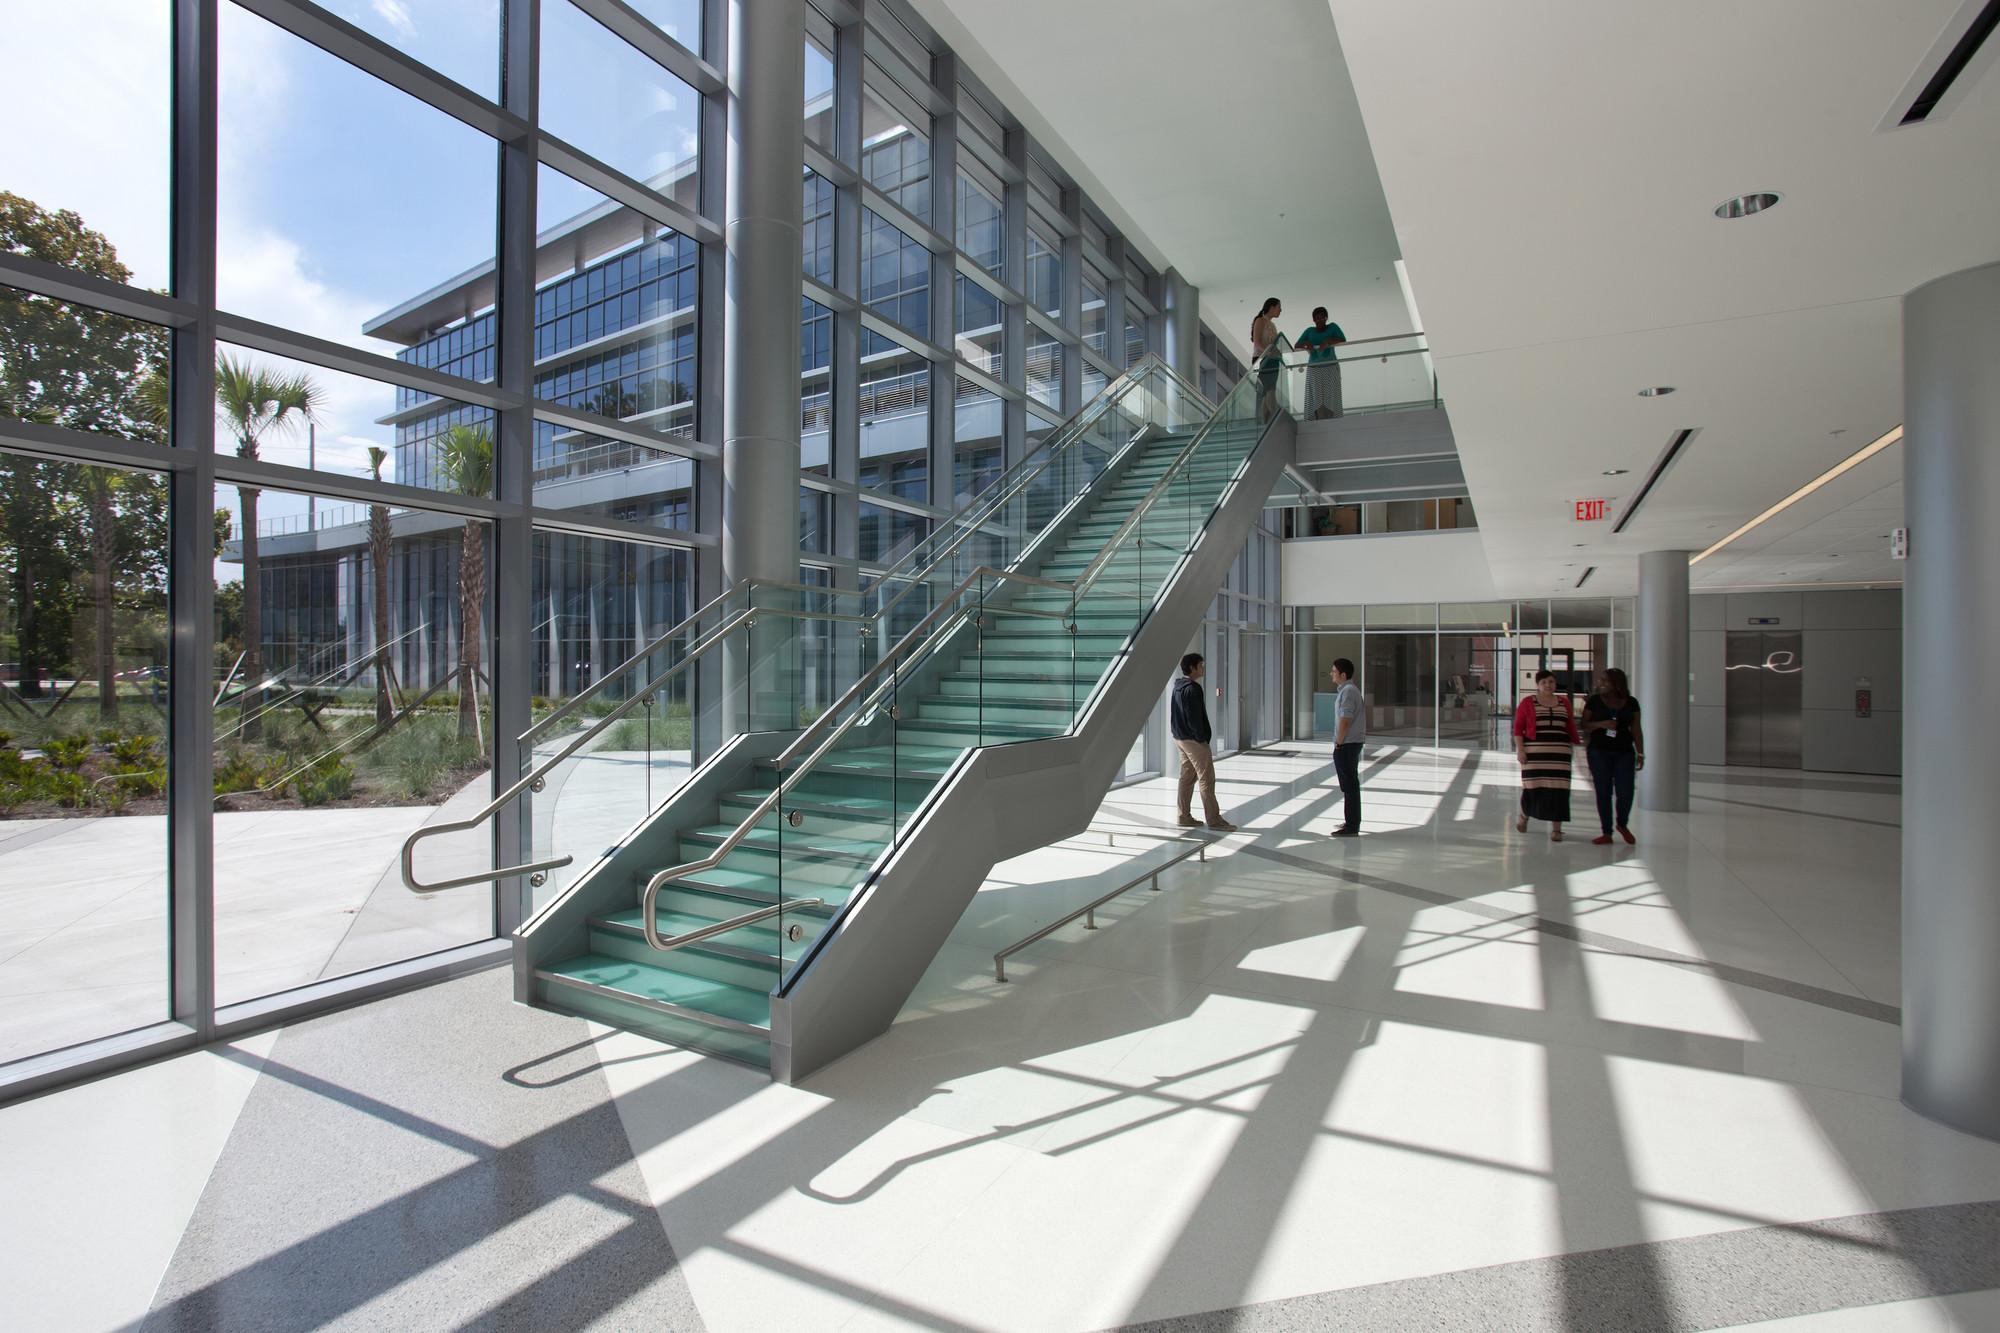 Carbon dating facilities at university of florida